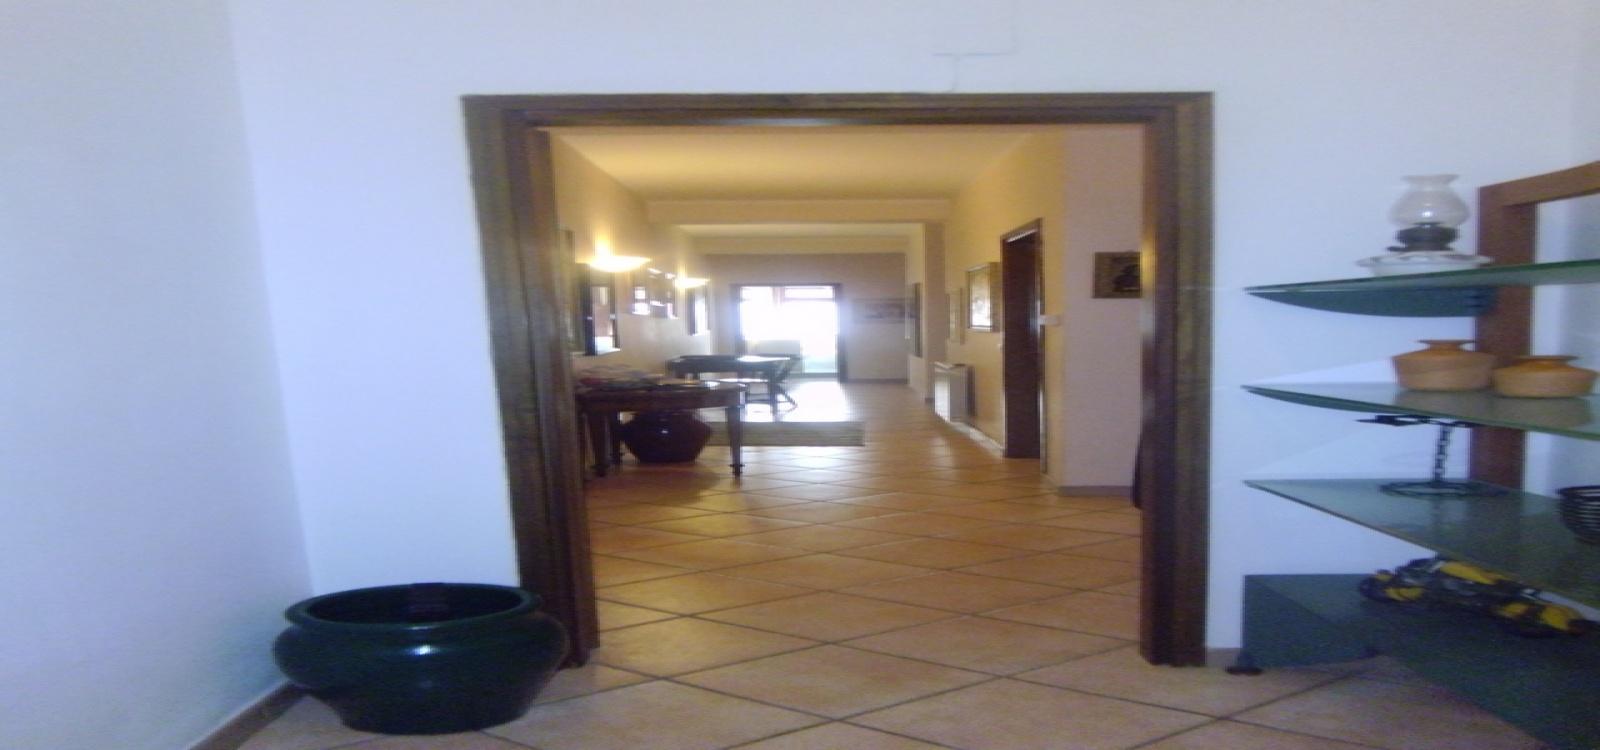 Viale Scala Greca,Siracusa,Appartamento,Viale Scala Greca,1017